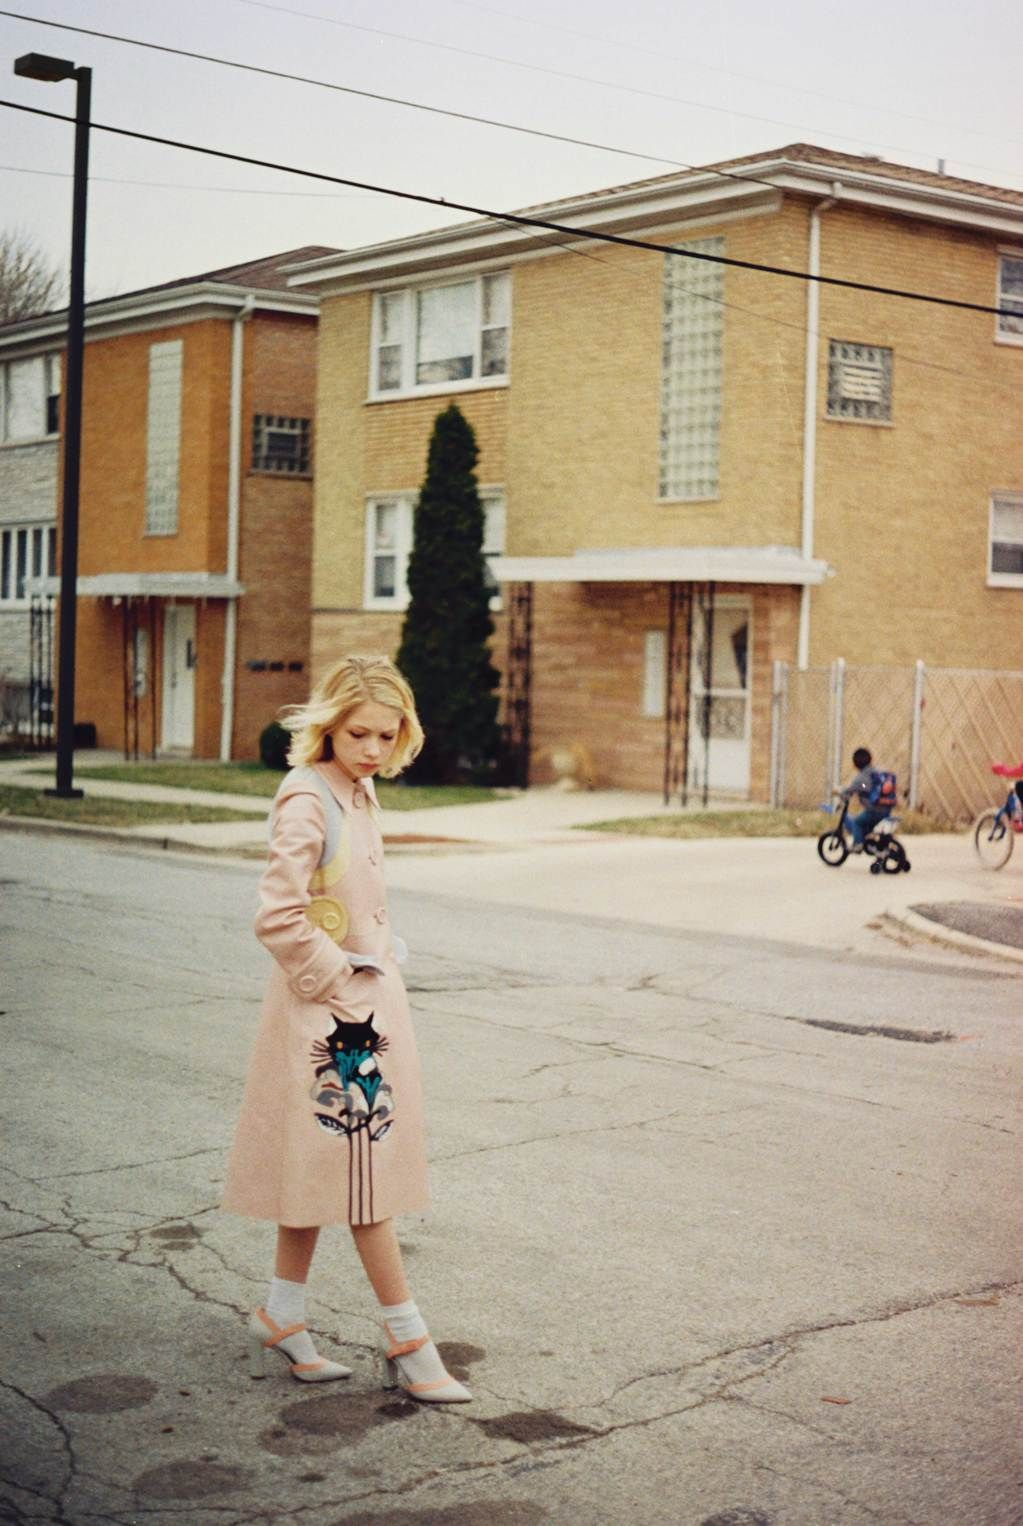 tavi gevinson, the pre-teen sensation turned media queen | i-D Magazine